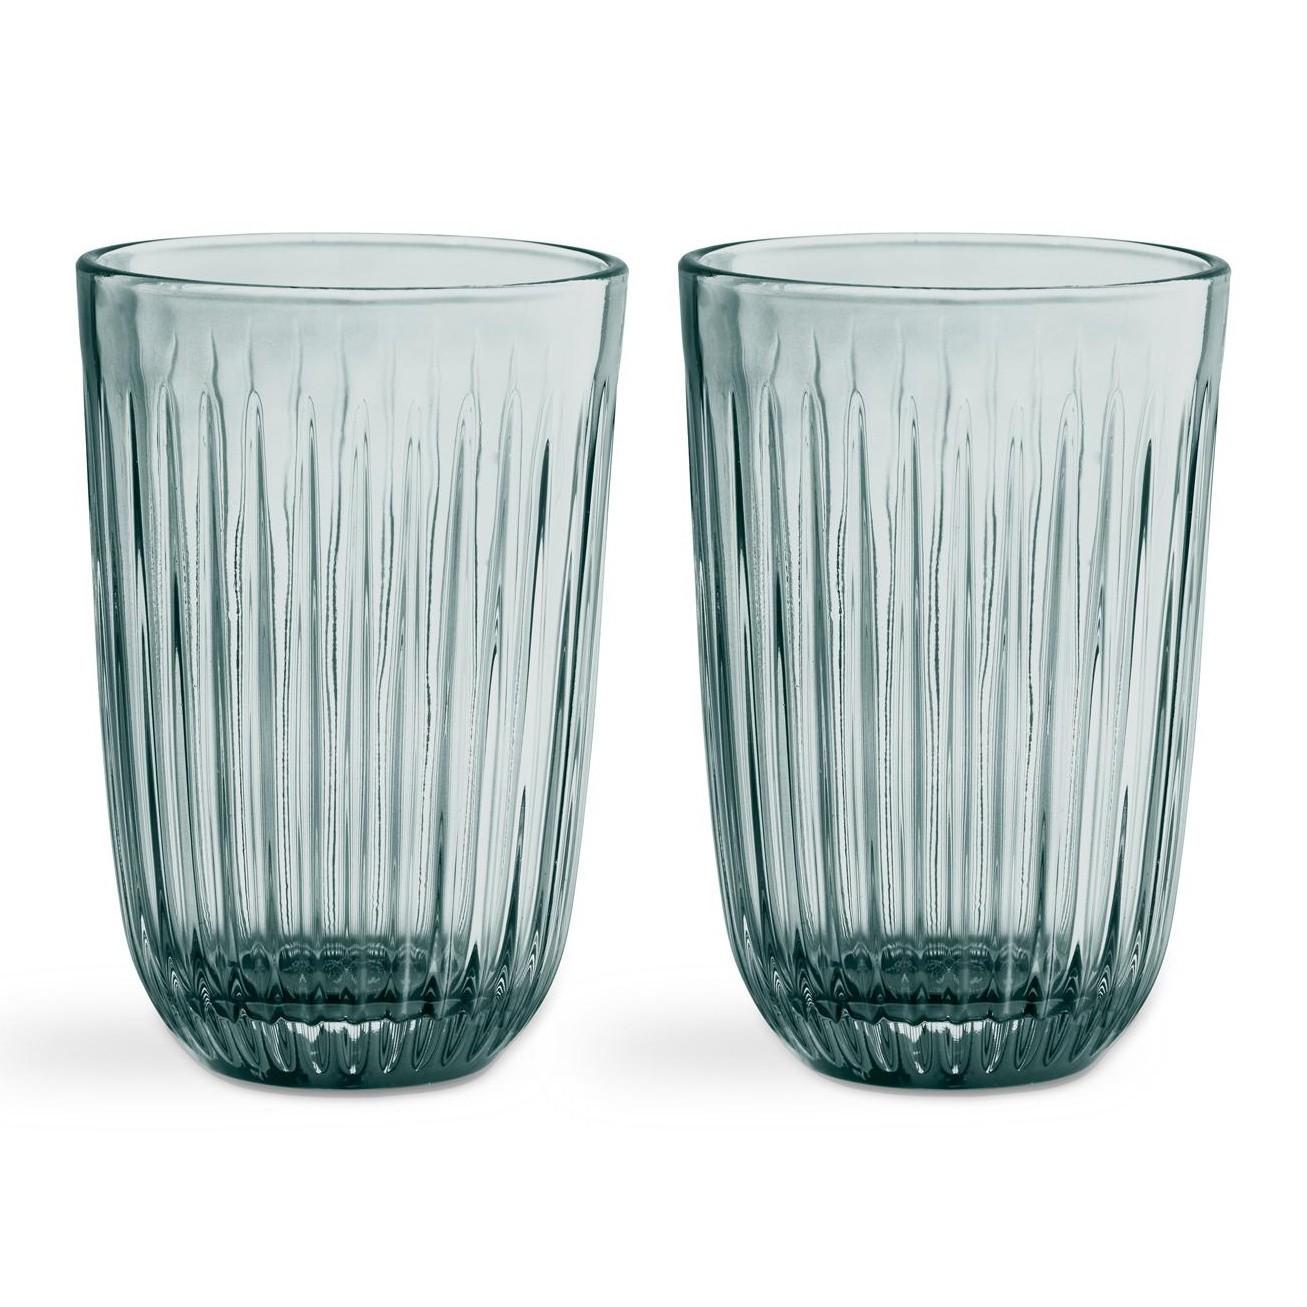 Trinkglaser Set Trinkglas Set Deckel